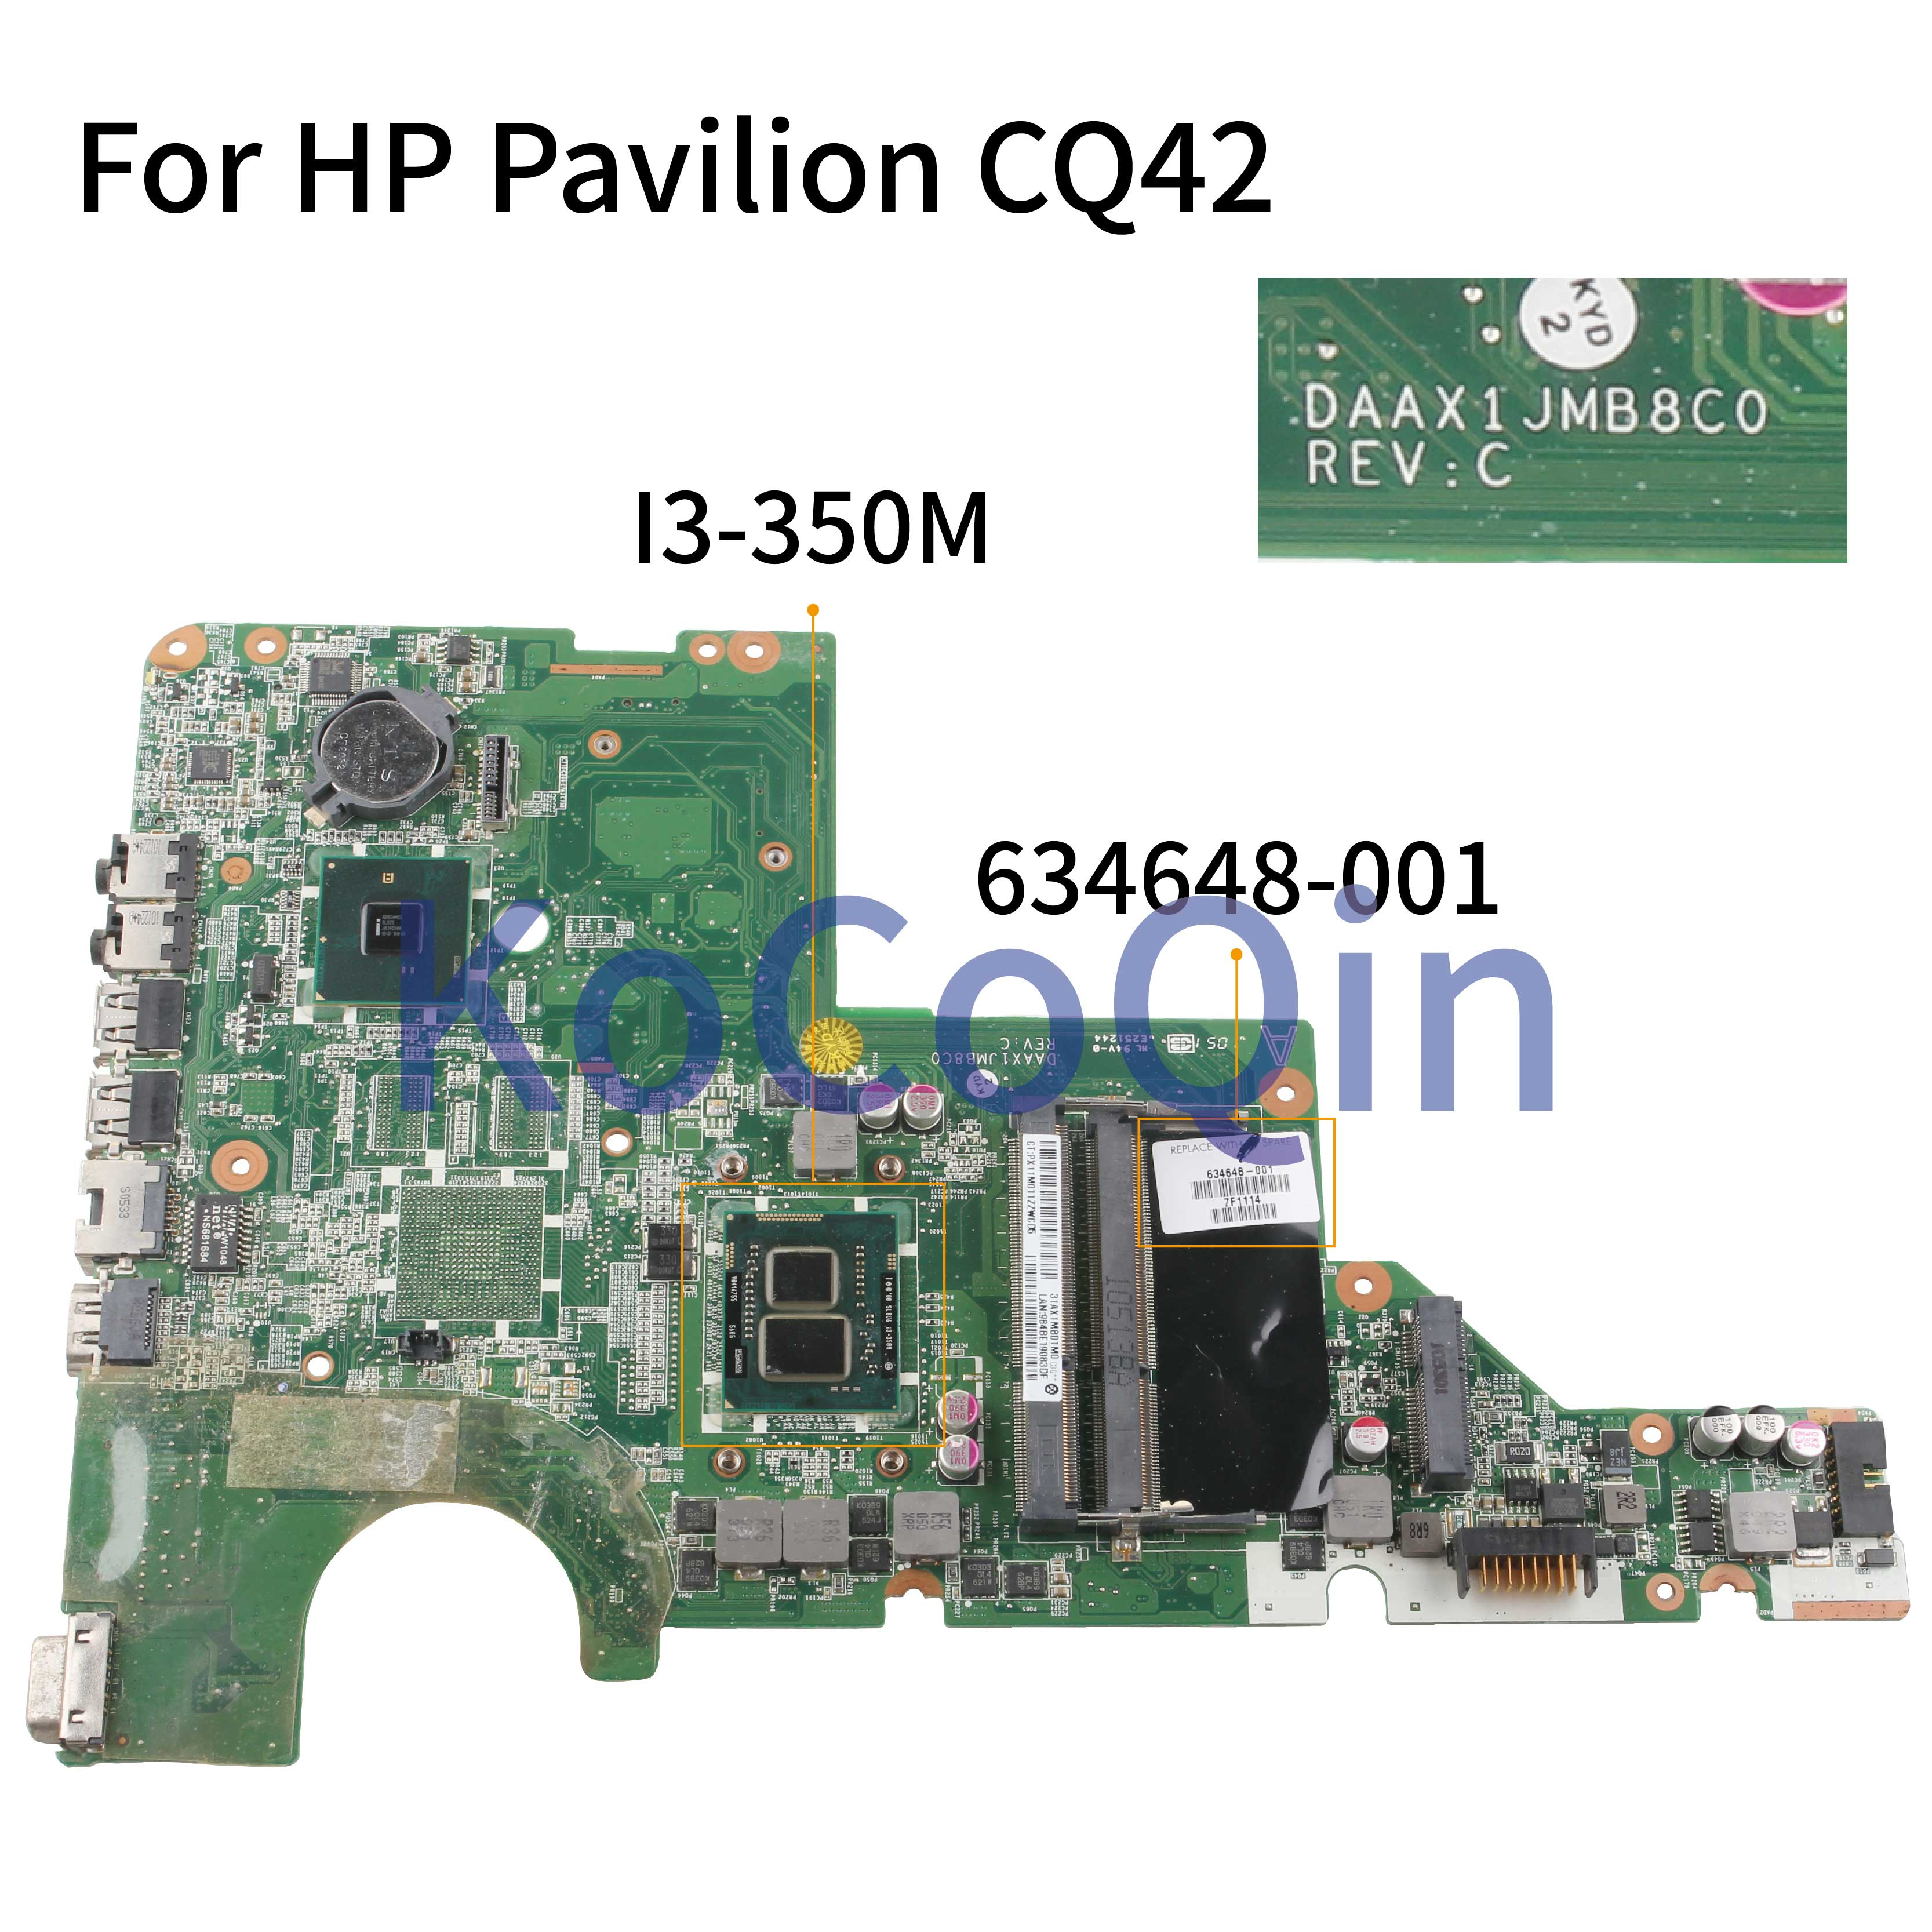 KoCoQin Laptop Motherboard For HP Pavilion CQ42 CQ62 G42 G62  I3-350M Mainboard DAAX1JMB8C0 634648-001 634648-501